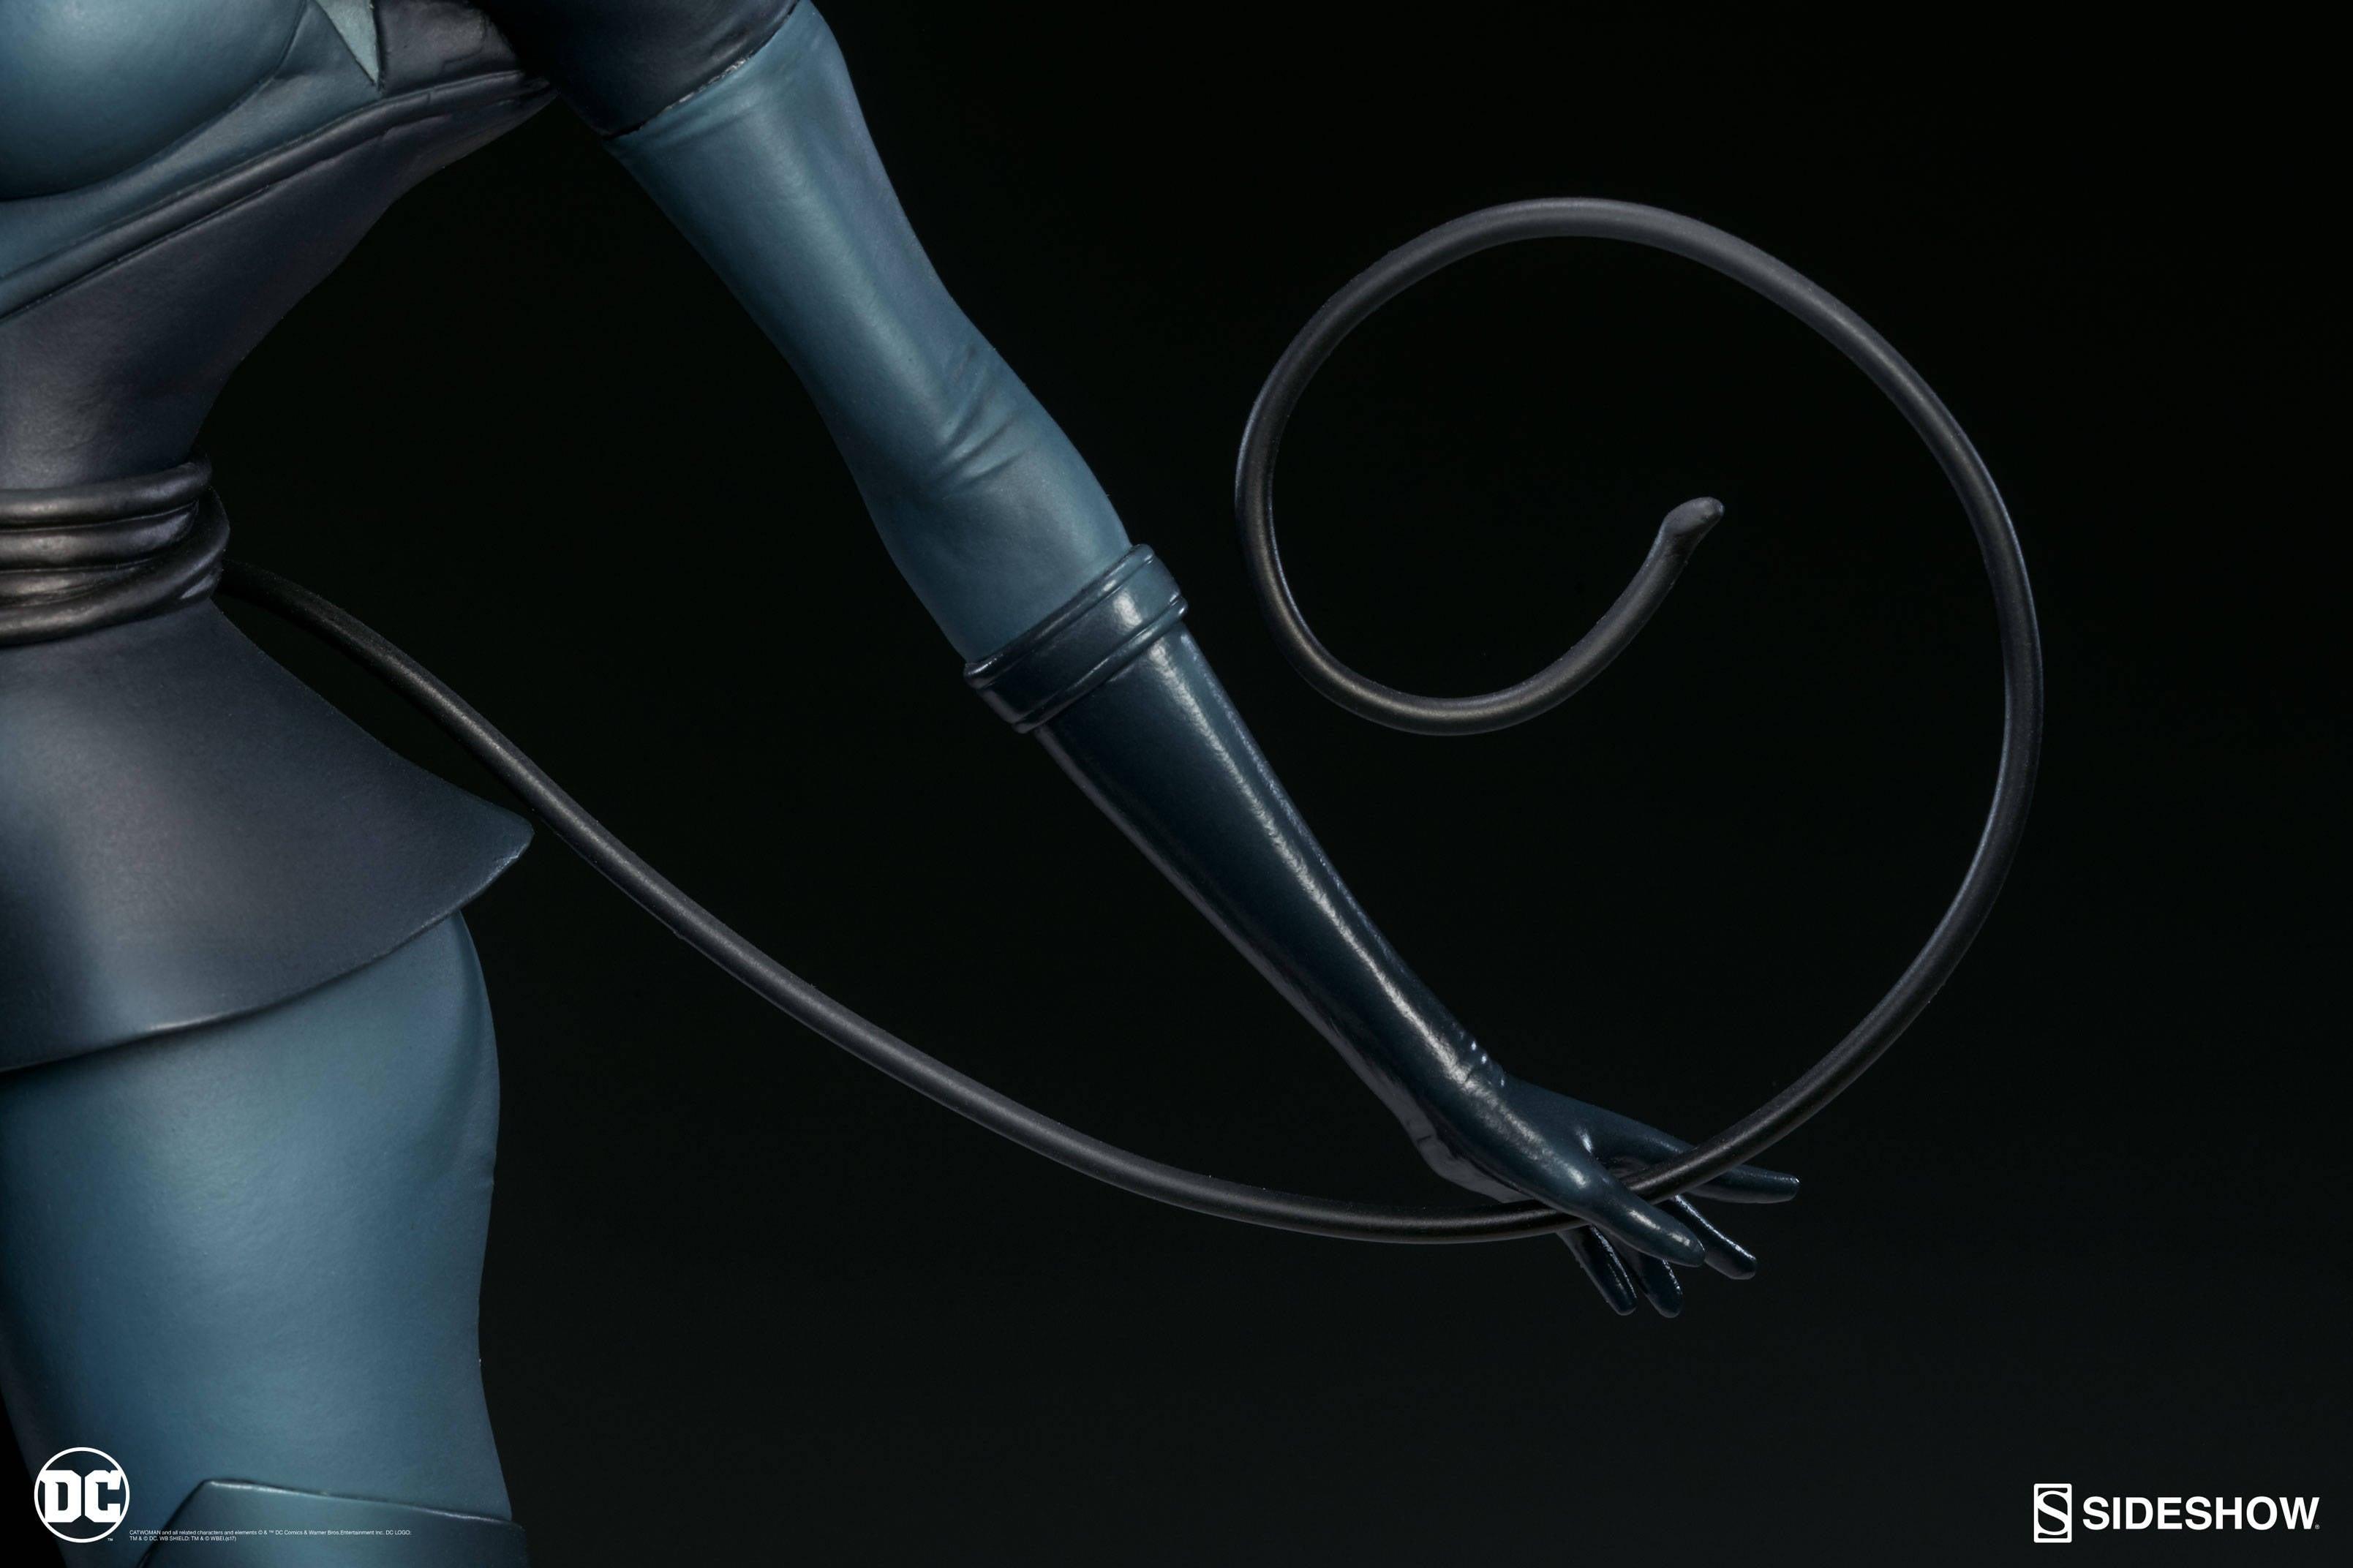 Catwoman-Sideshow-Artgerm-Statue12